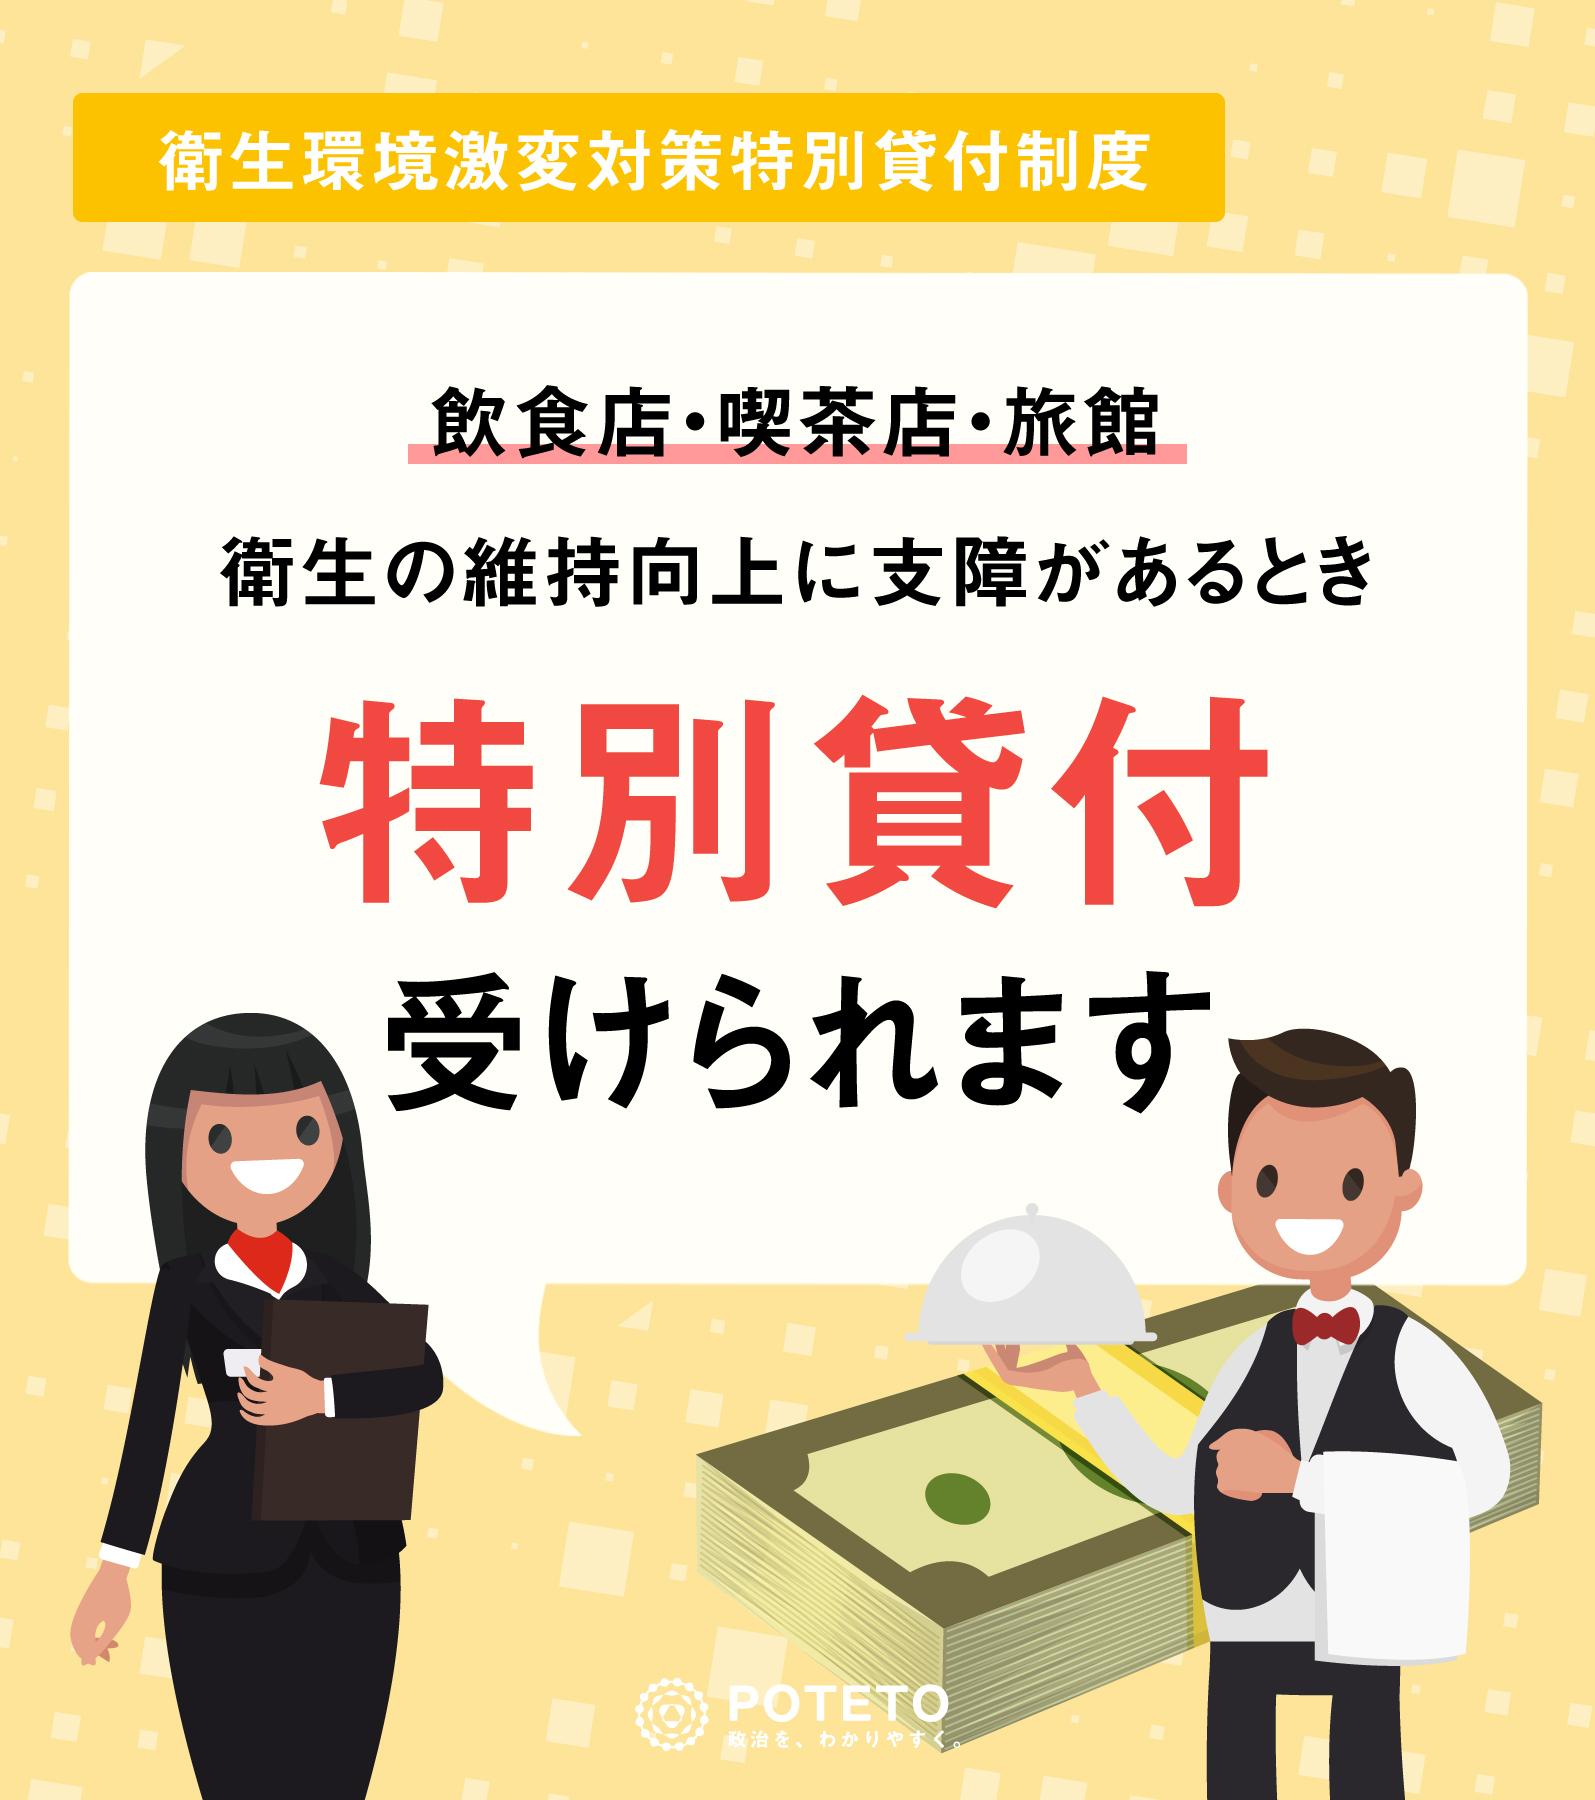 9ab6ce4b4bae6ce4c1dcb9e5af0d1f27 - 衛生環境激変対策特別貸付制度